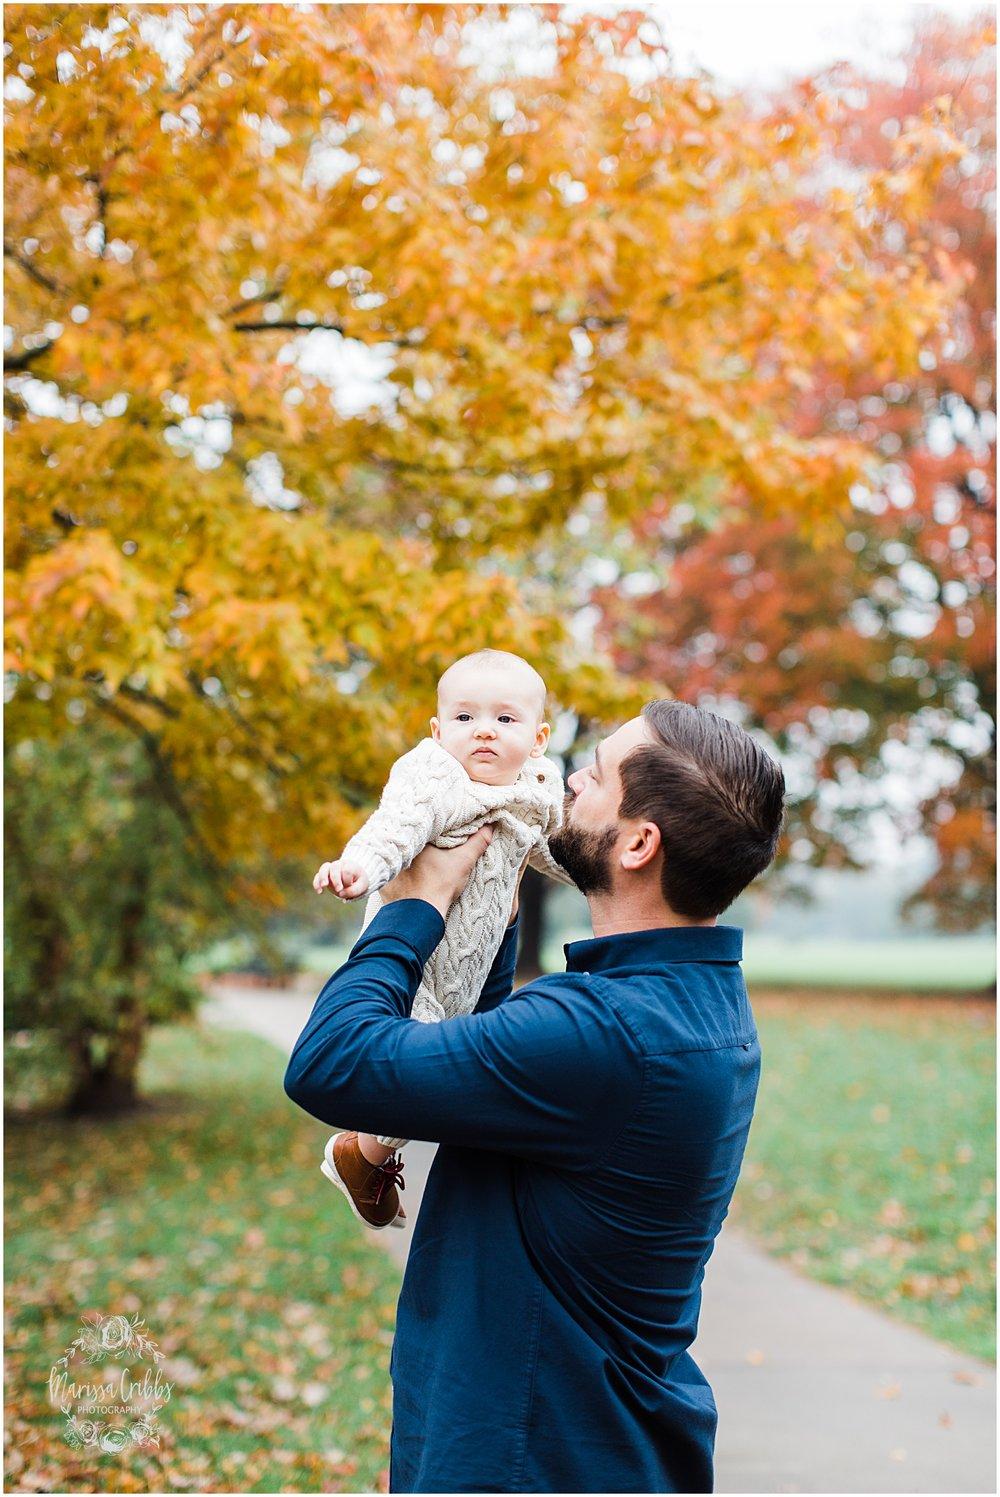 MILLER FAMILY LOOSE PARK | MARISSA CRIBBS PHOTOGRAPHY | KC FAMILY PHOTOGRAPHY_3793.jpg